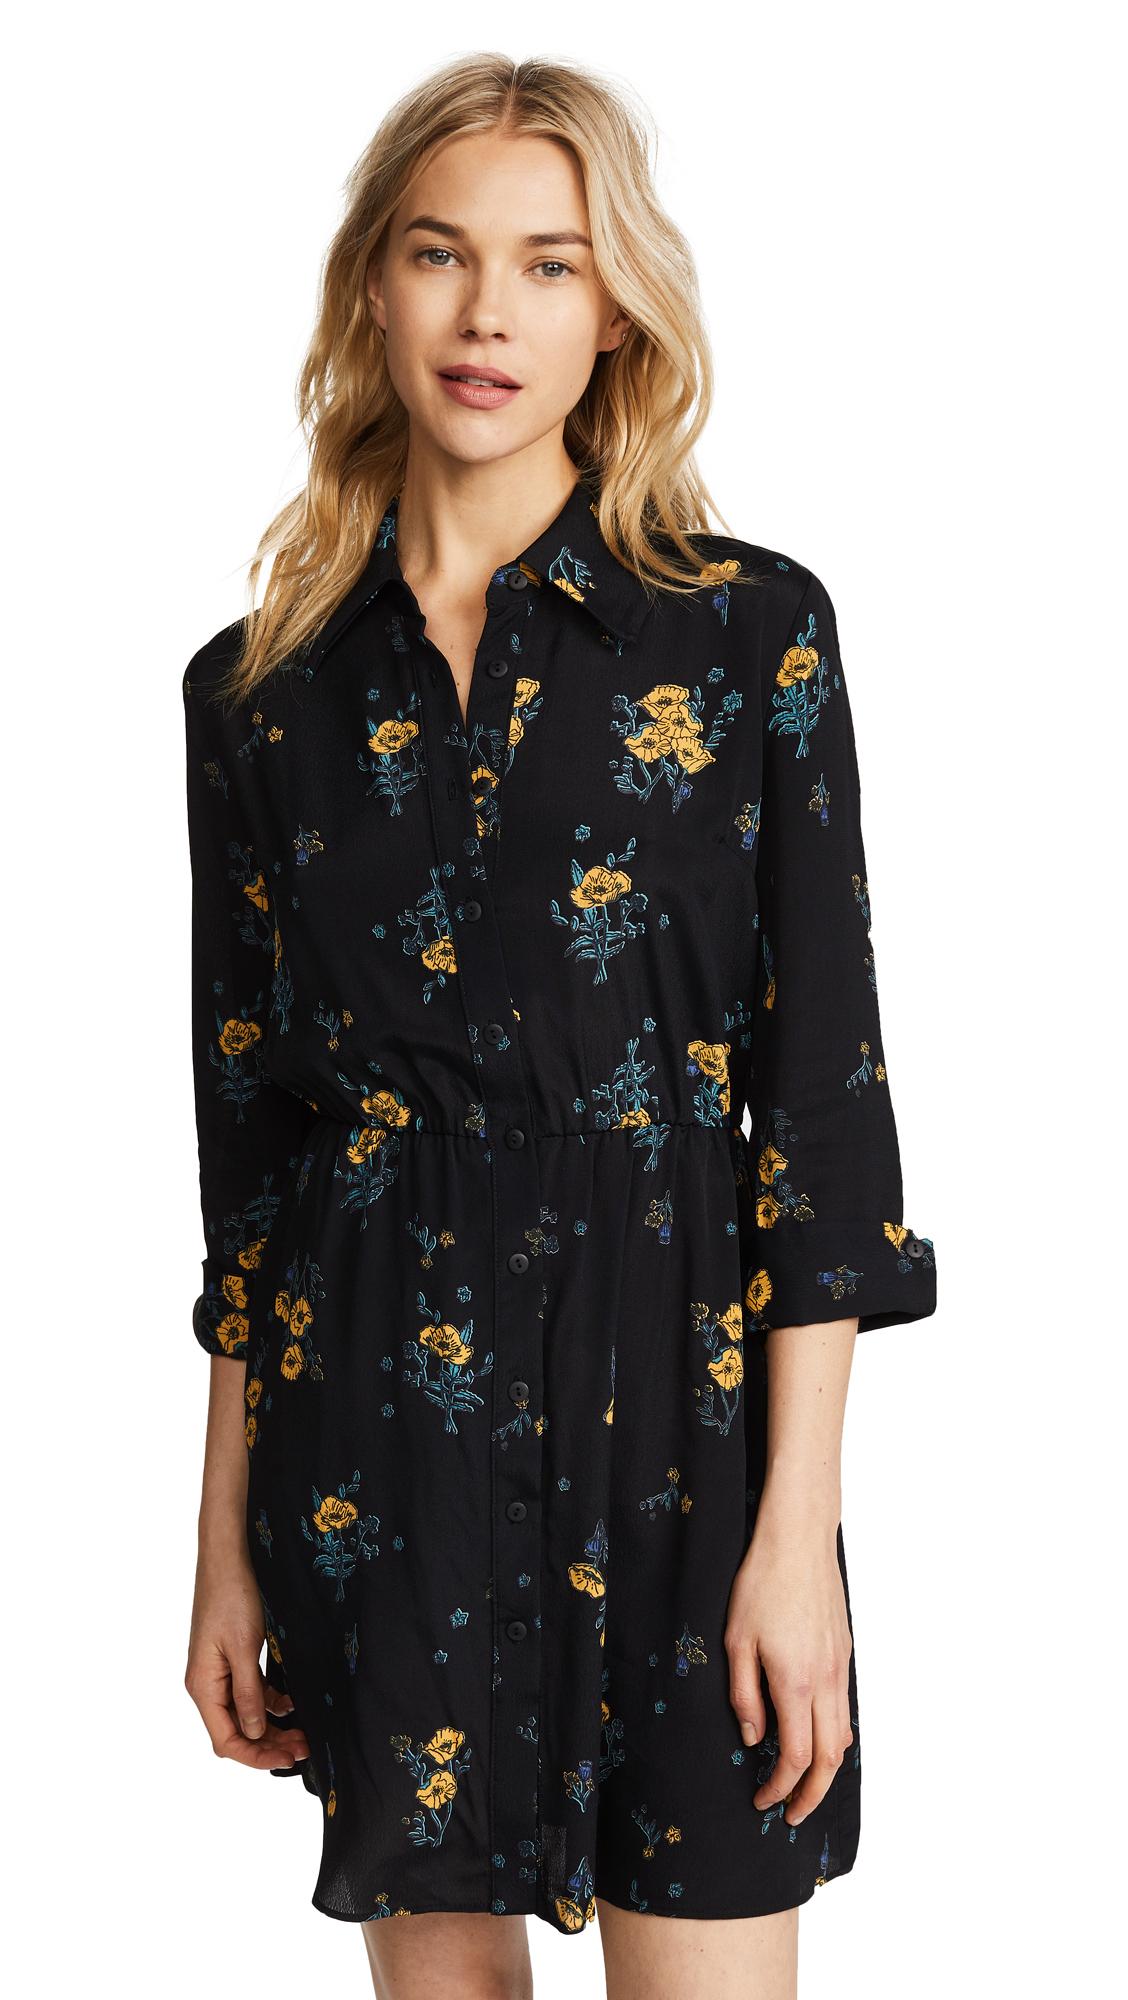 RUKEN Caroline Dress In Black Floral